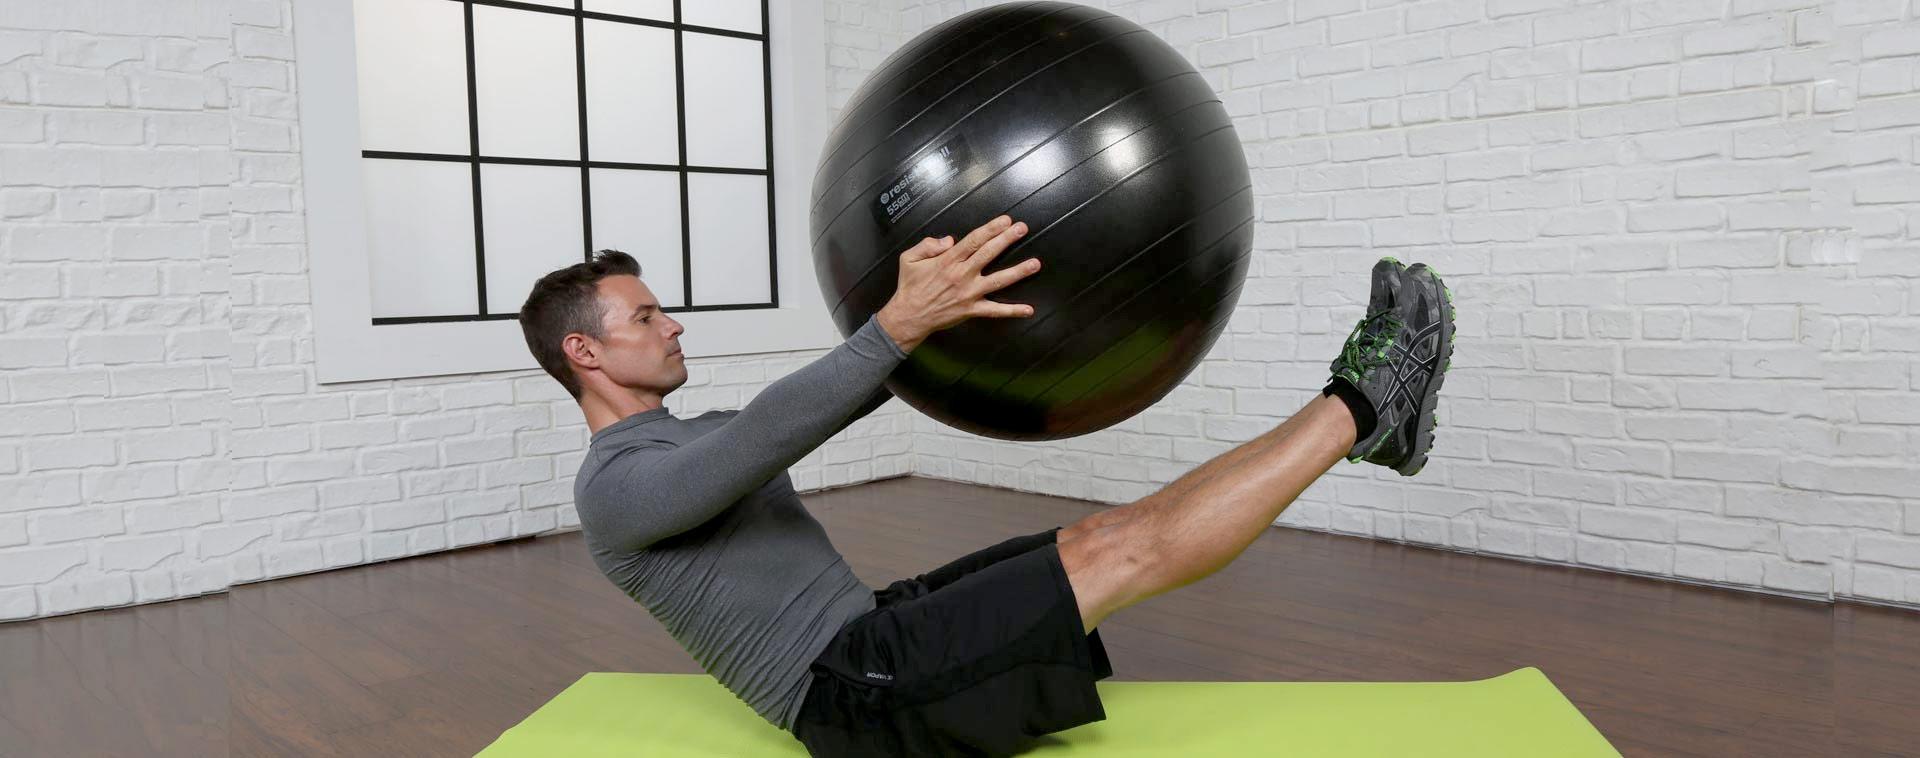 NL - SP - Cat - Stability Balls